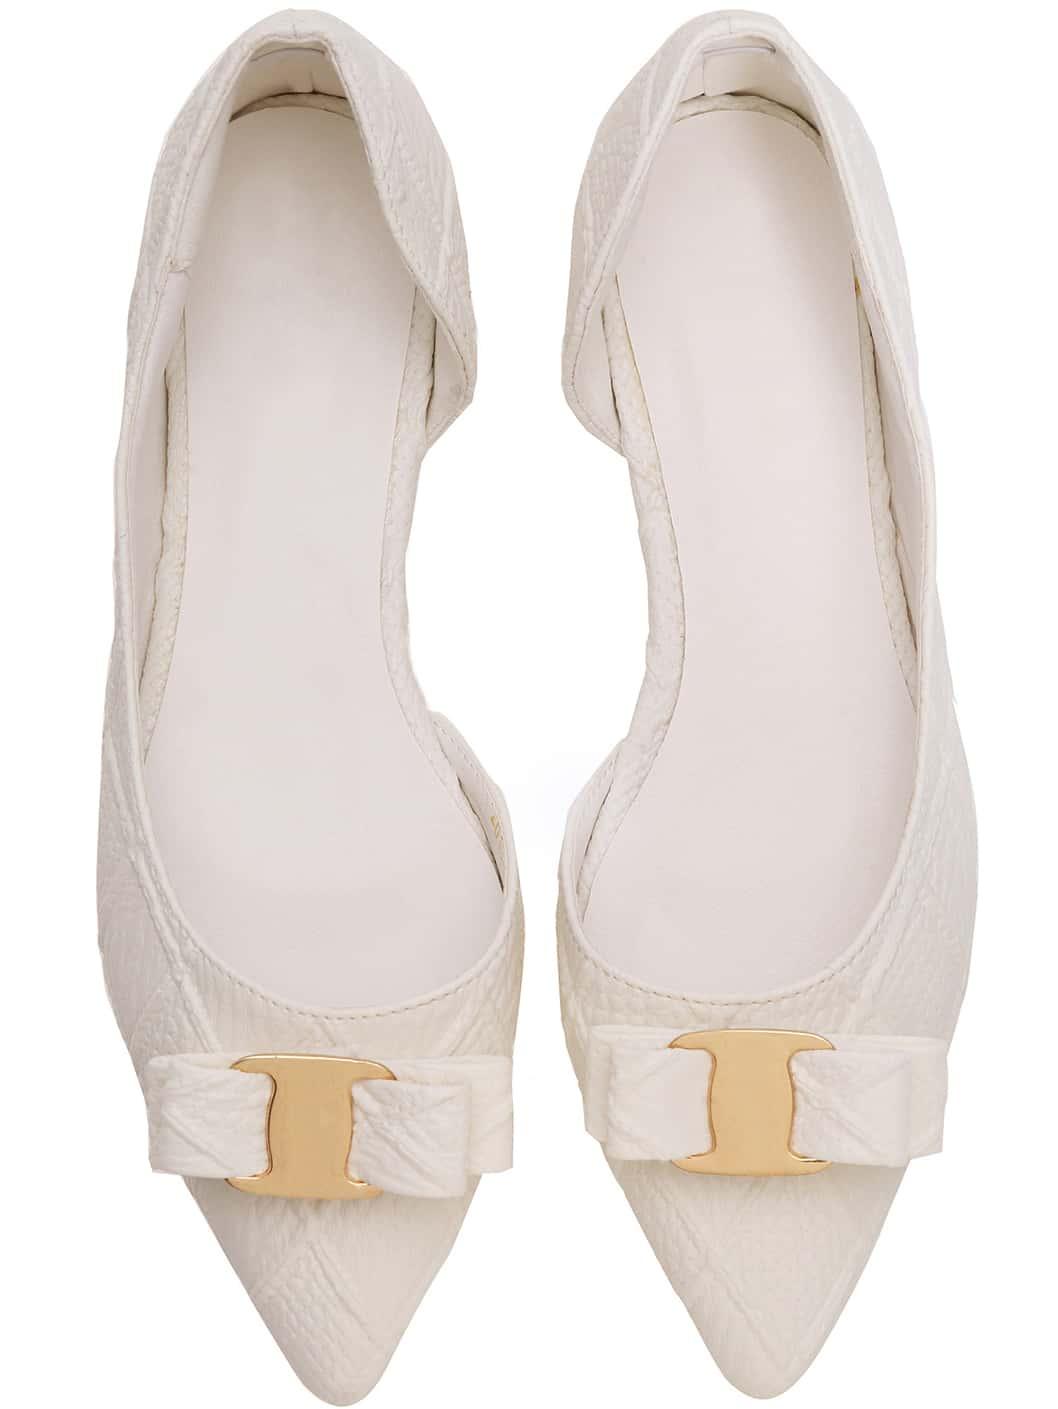 White Point Toe Bow Diamond Pattern Flats -SheIn(Sheinside